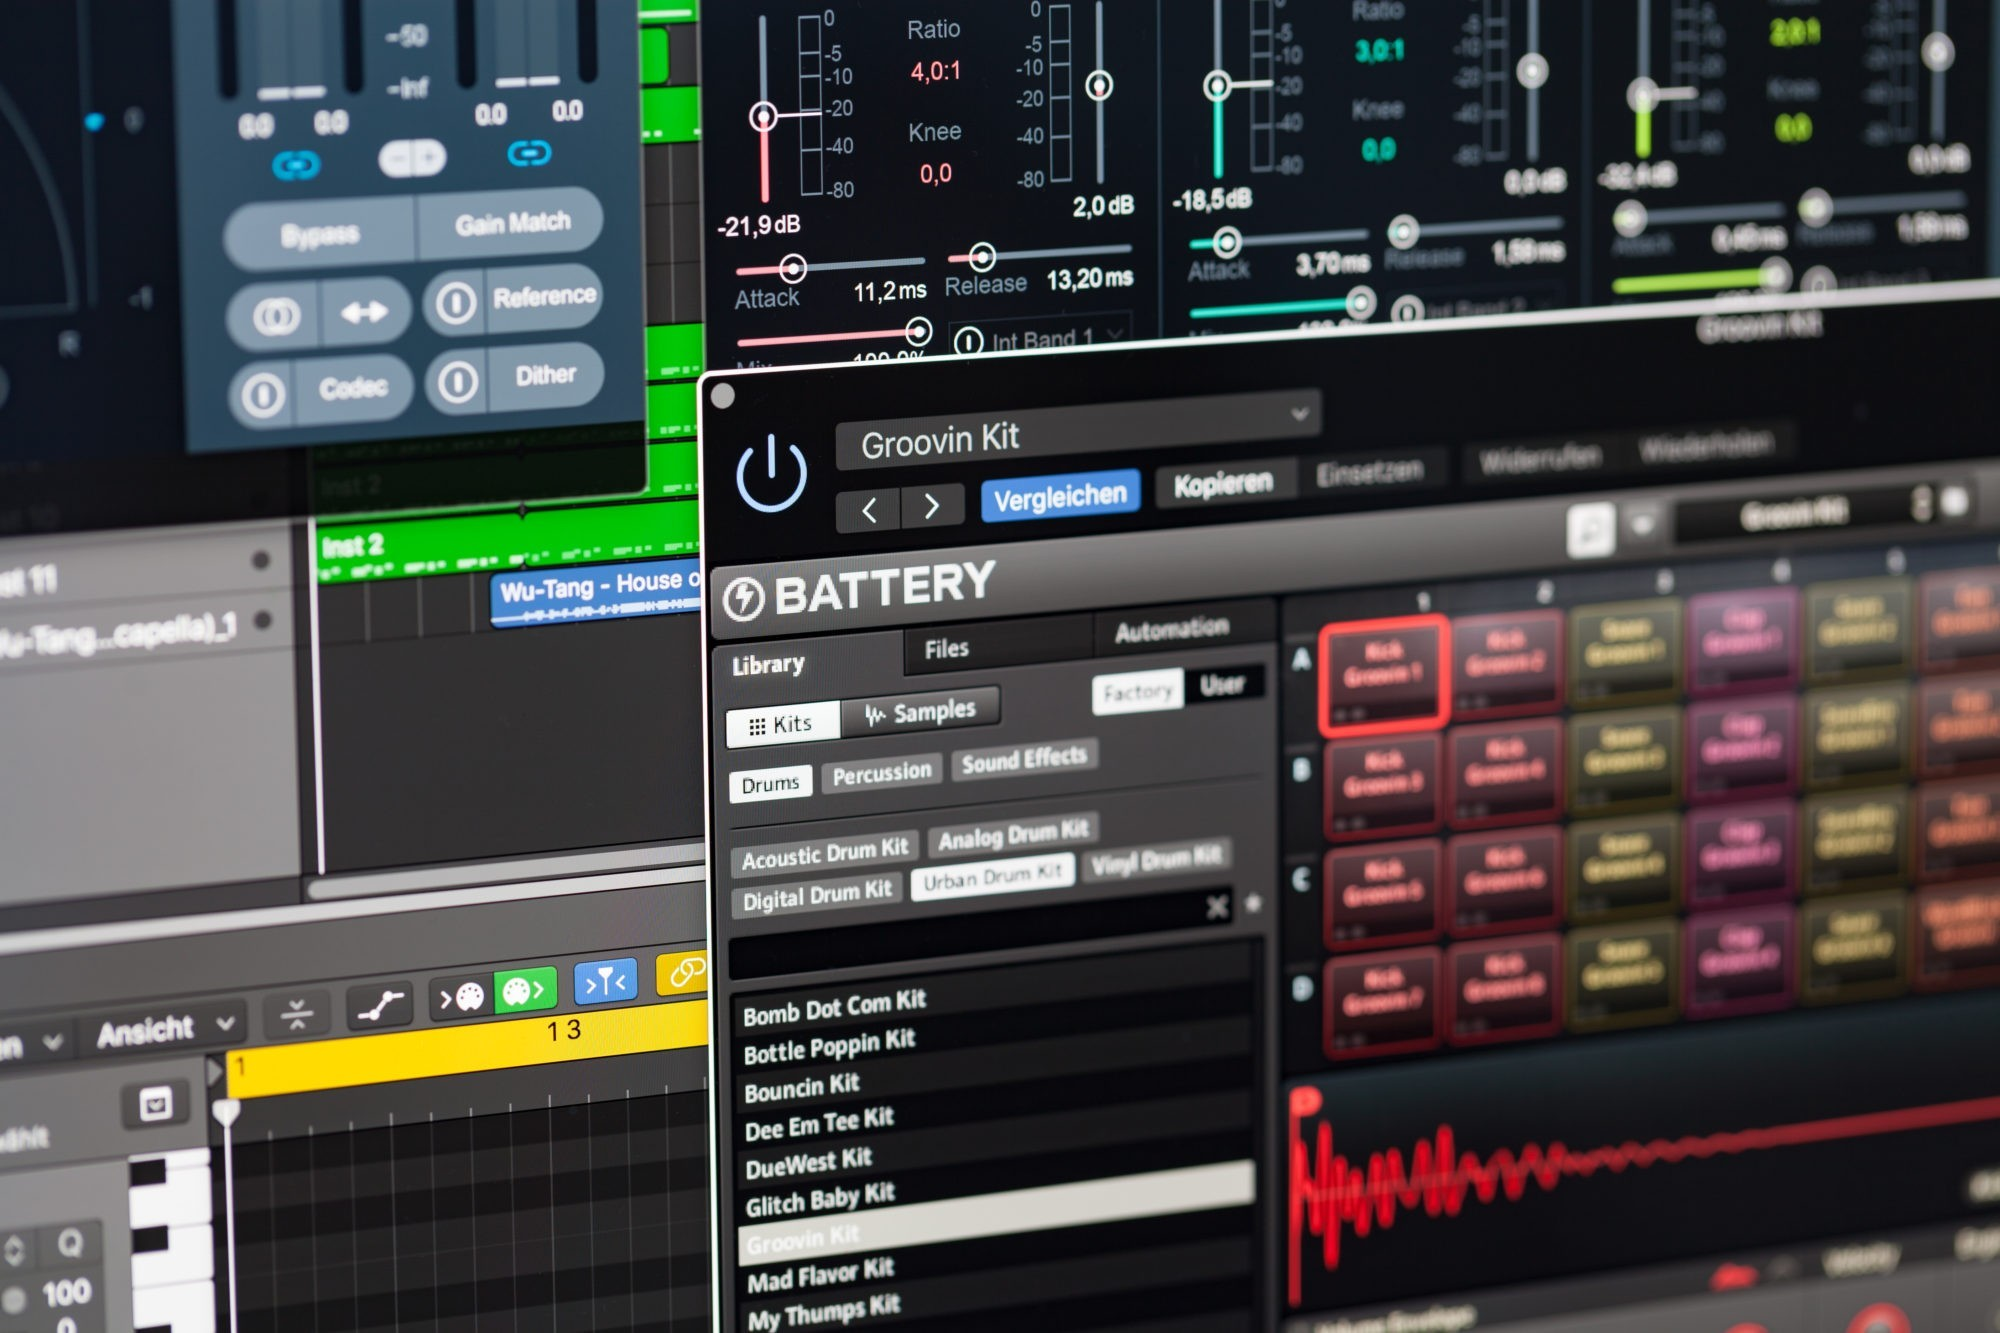 Instrumentals & Beats, Native Instruments Battery, STRAINX